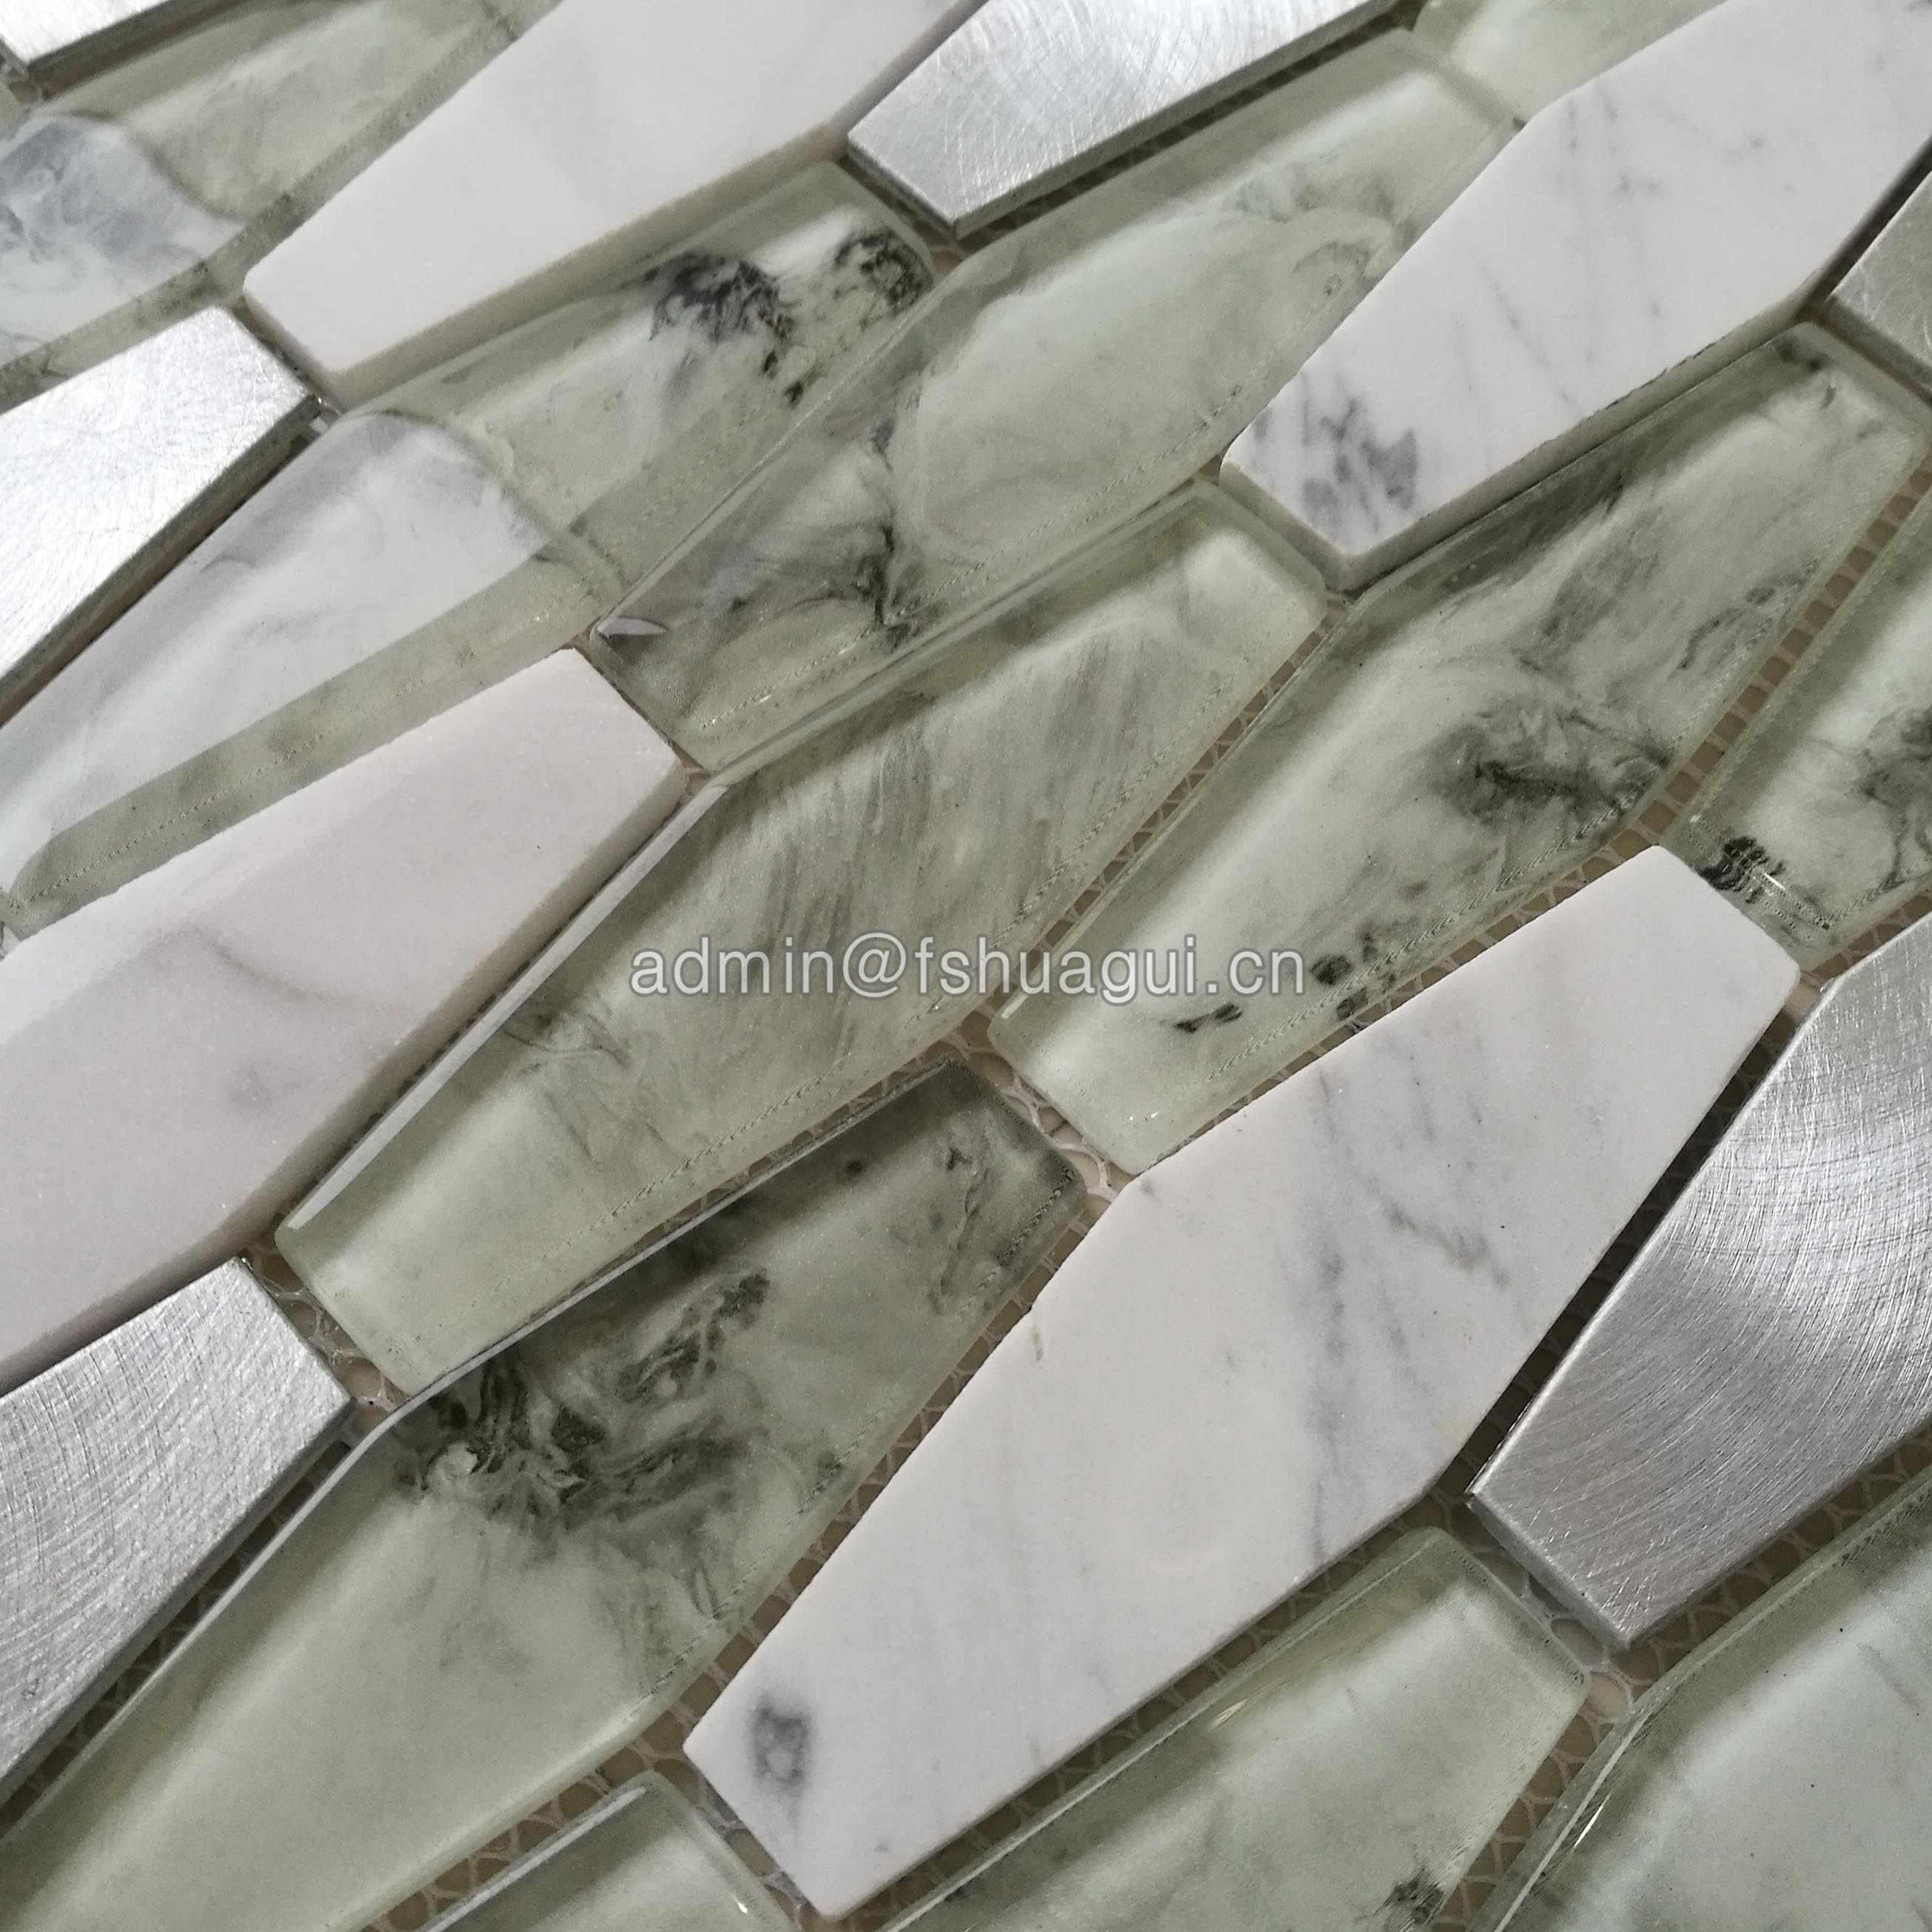 Huagui Hexagon 8mm Glass Stone Metal Backsplash Wall Tile White GLASS MOSAIC TILE image117